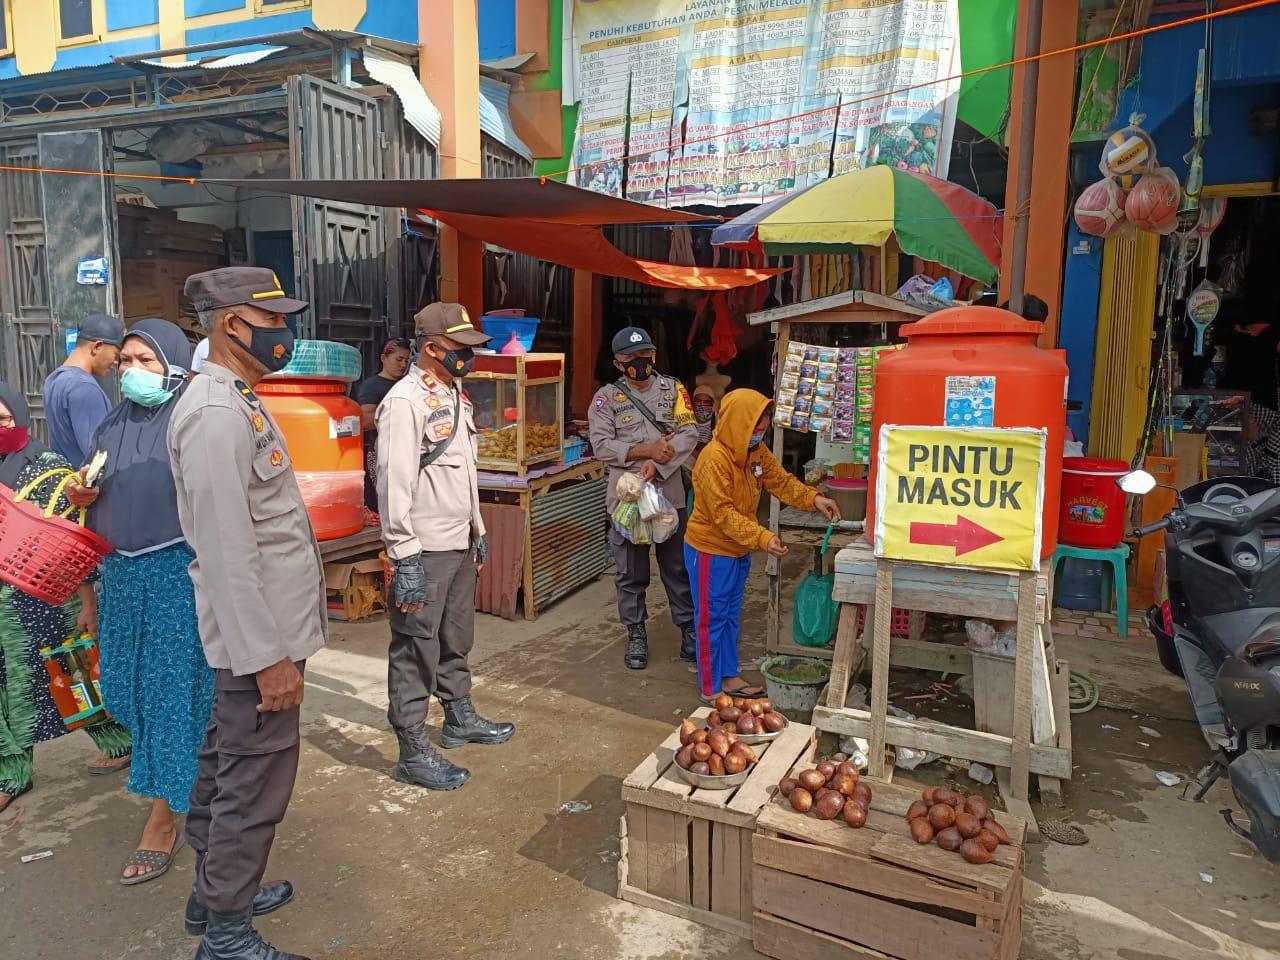 Bersama Wakapolsek Lilirilau Pimpin Pam Pasar Sentral Cabenge, Berikan Imbauan Protapkes Kepada Pengunjung